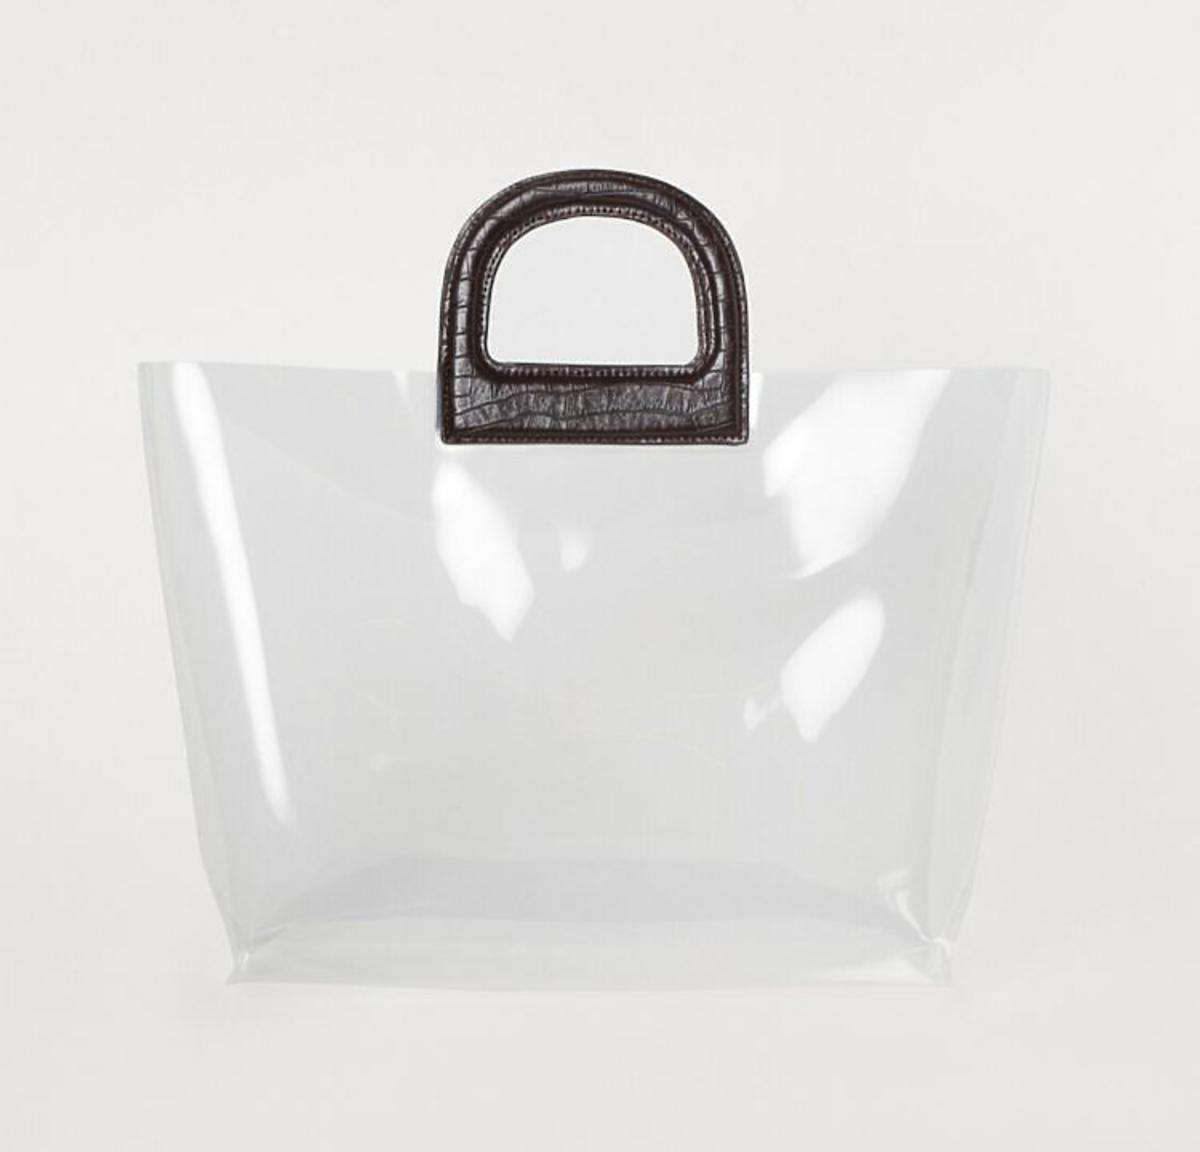 Torba plastikowy shopper H&M